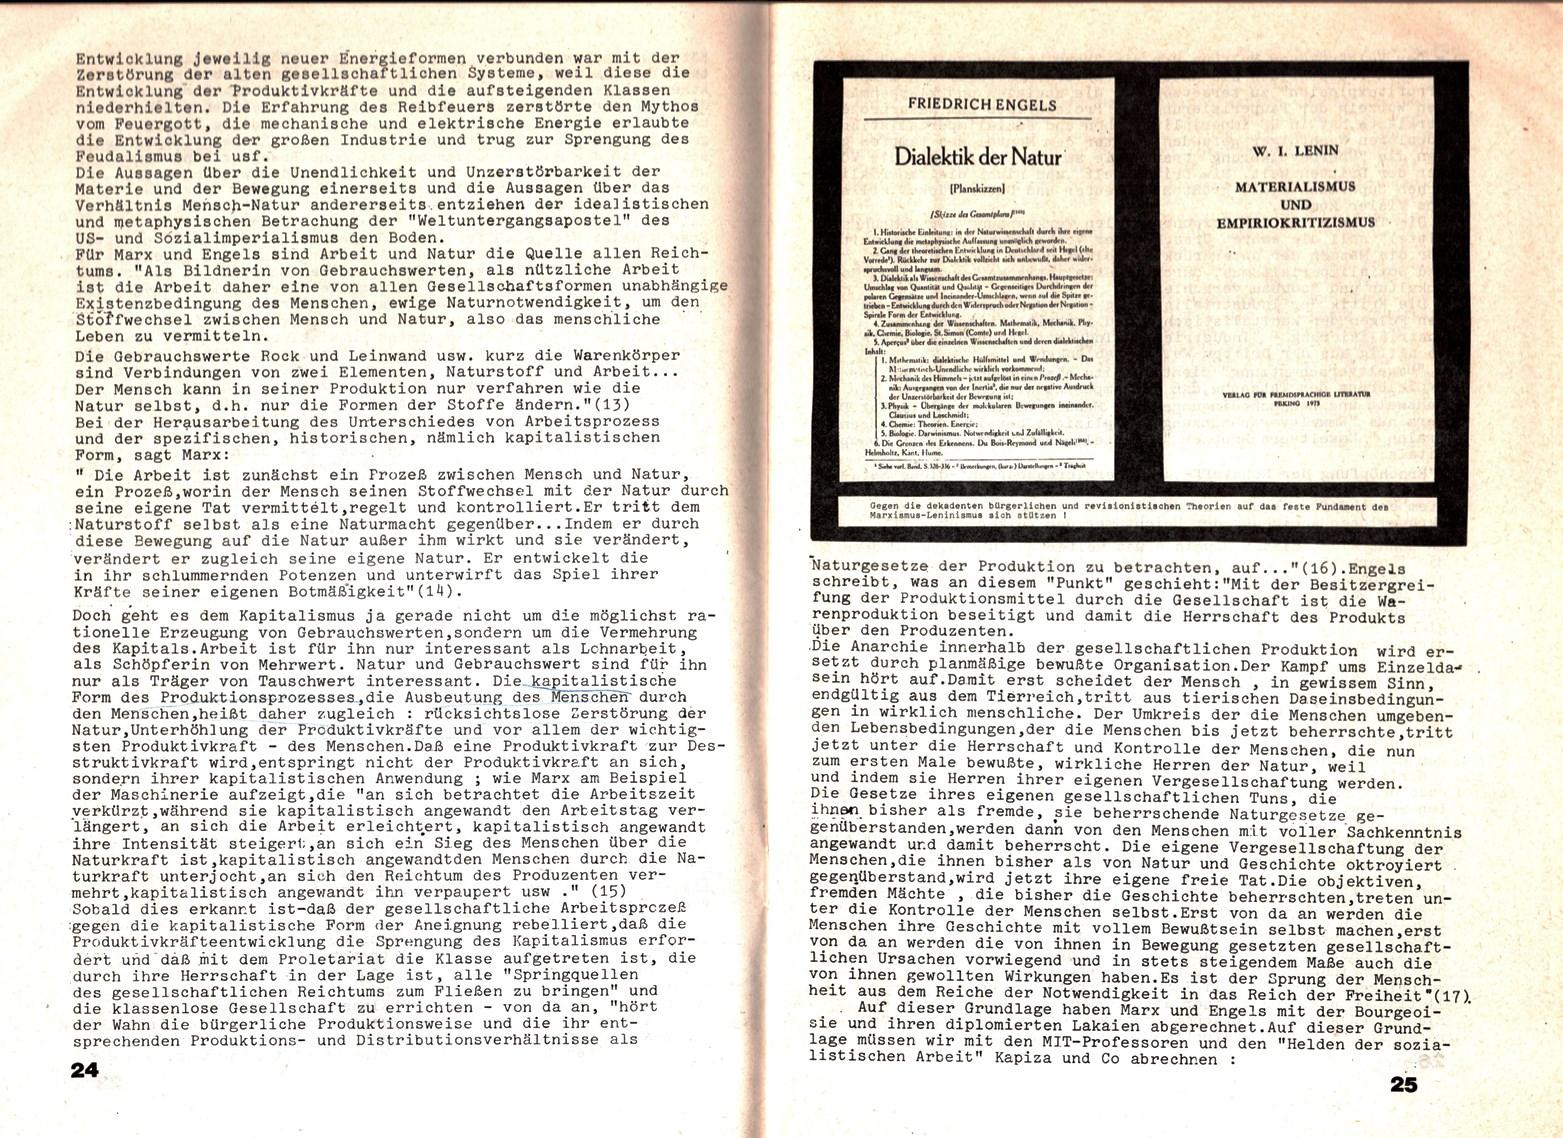 KSV_1976_Atomenergie_im_Kapitalismus_014